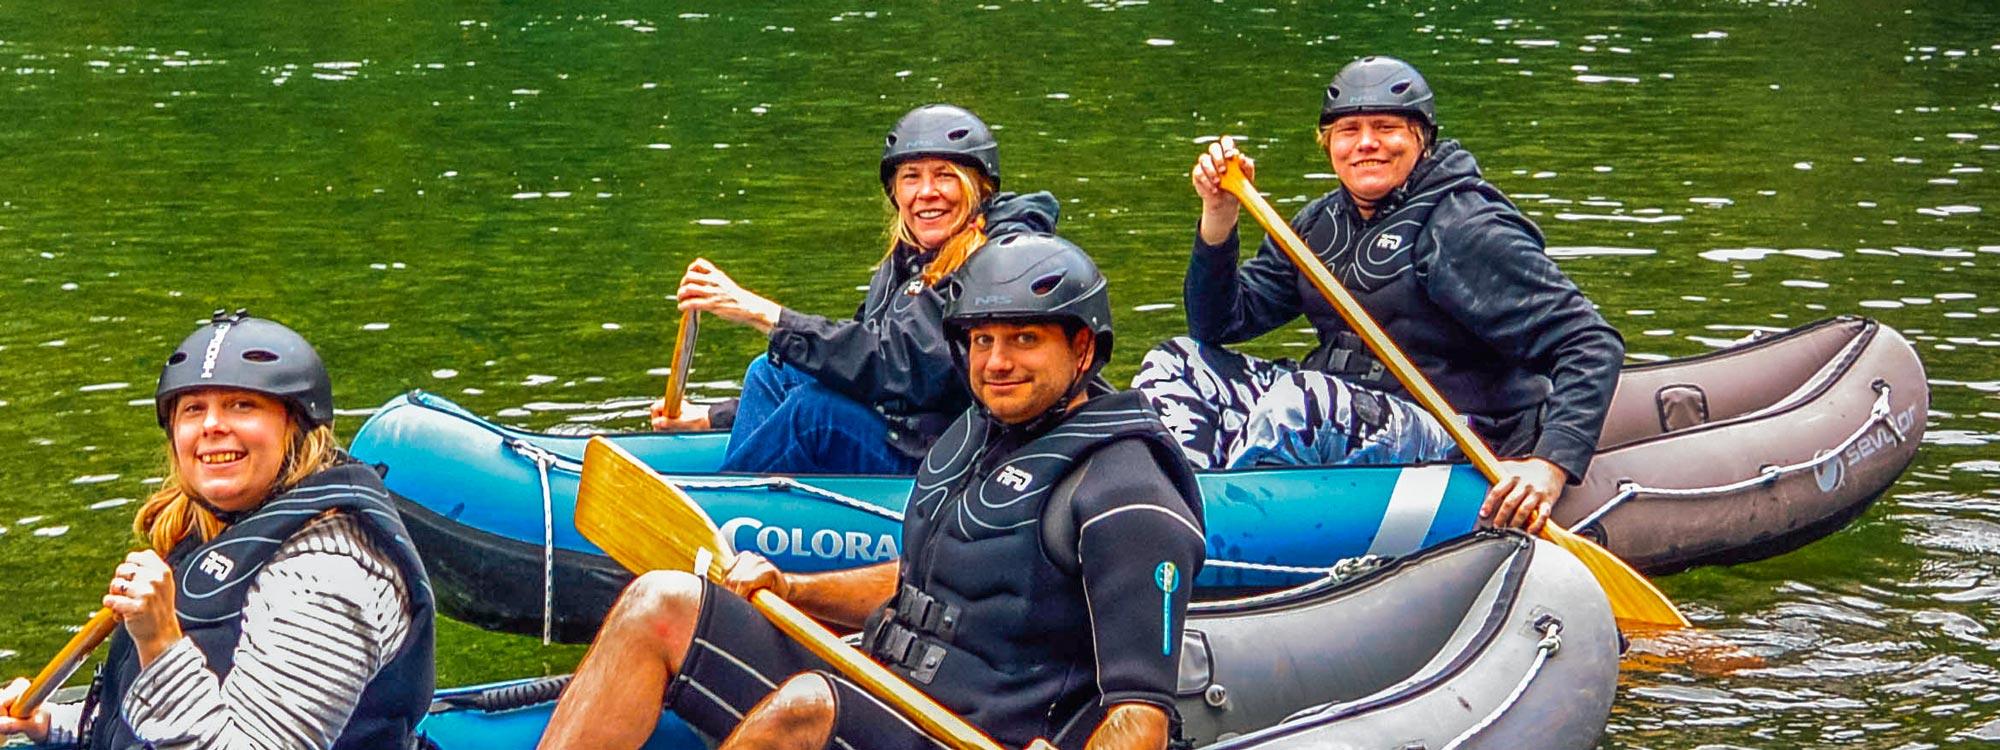 Hobbit Kayak Tour Gallery August 2018